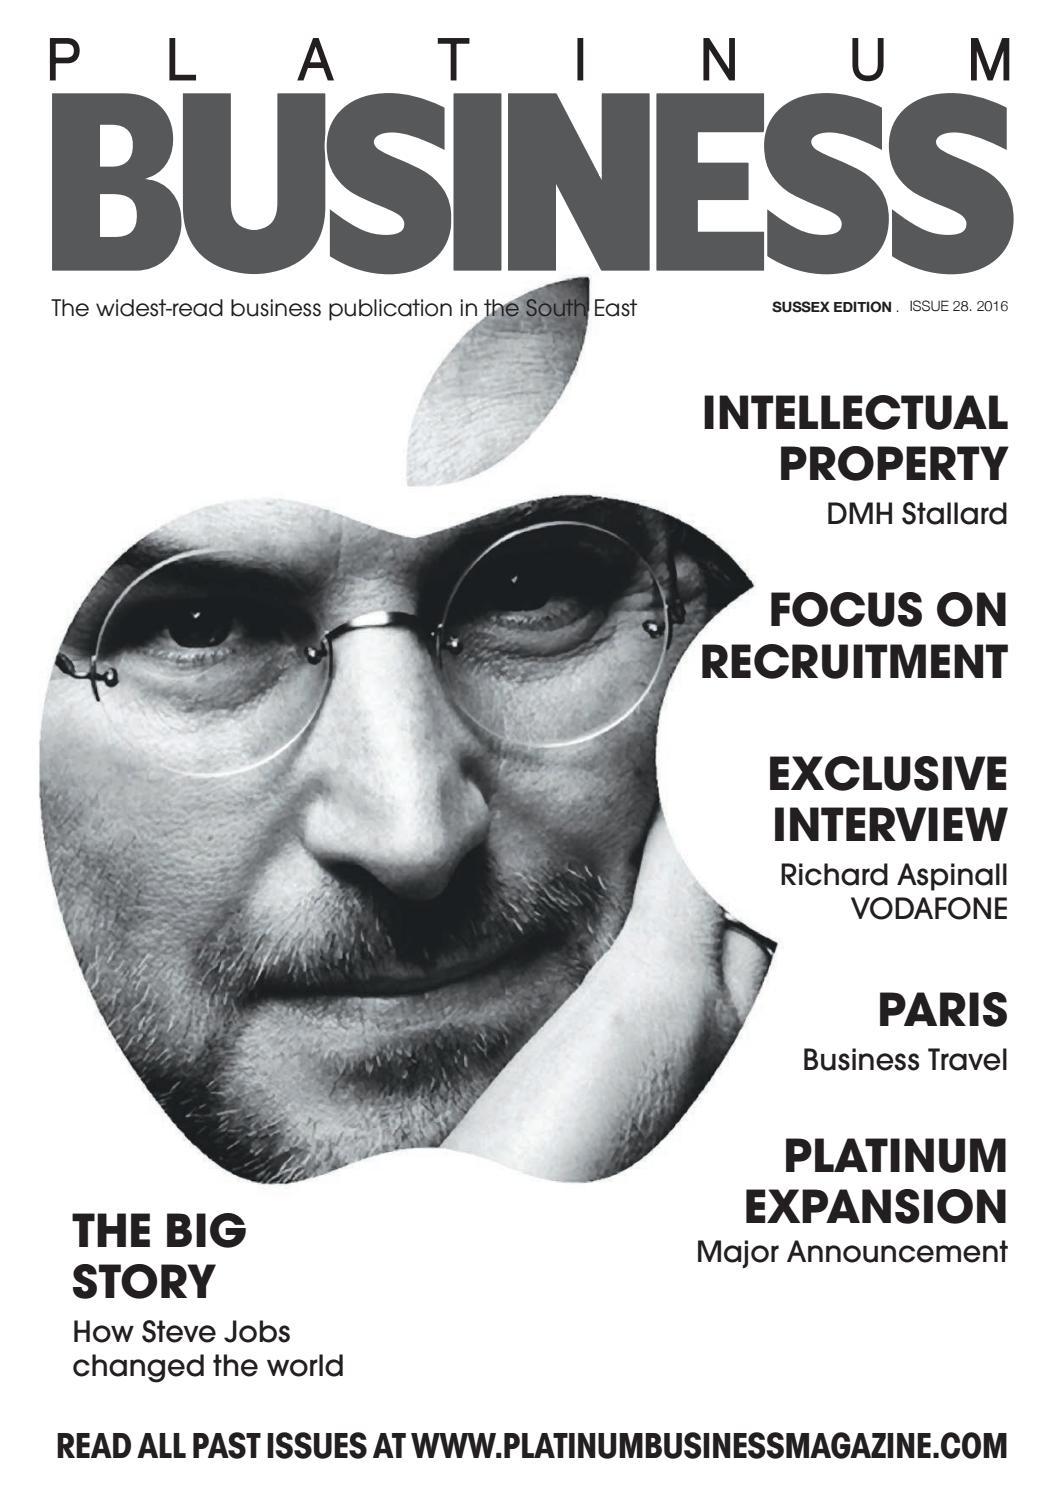 1039451f8da26 PLATINUM BUSINESS MAGAZINE - ISSUE 28 - SUSSEX EDITION by Platinum Business  - issuu